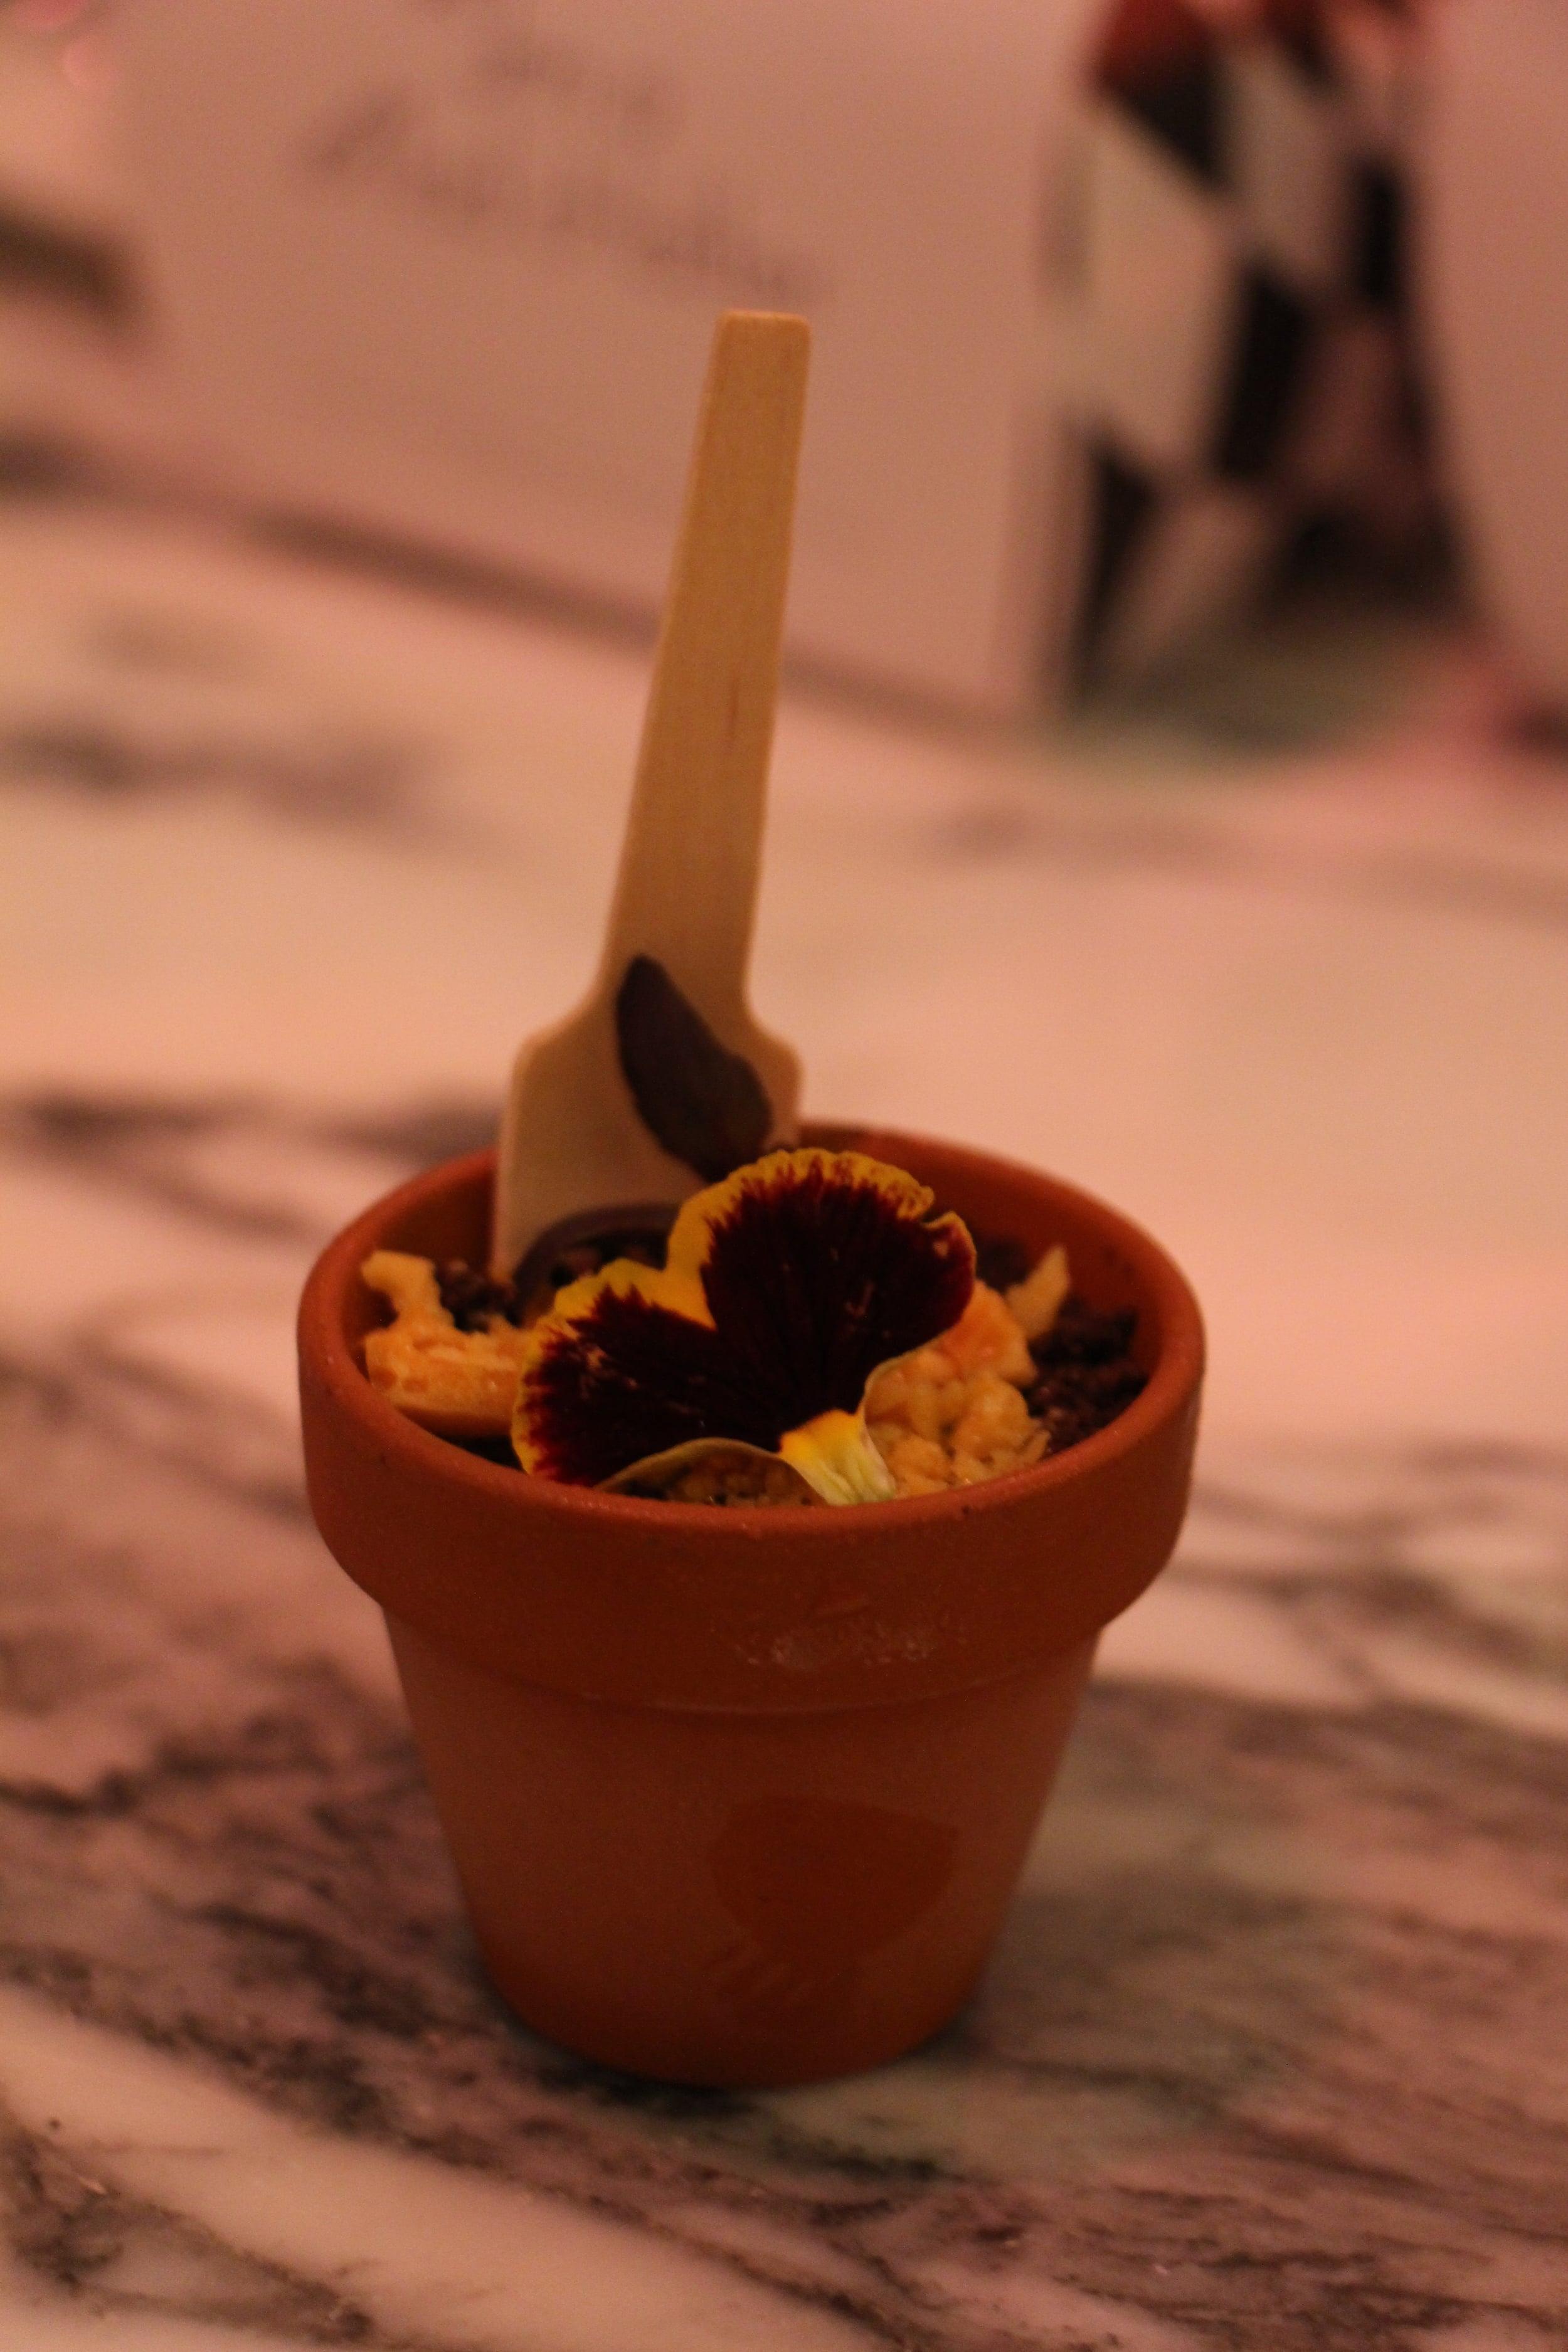 Ice cream with chocolate crumbs in a mini pot – too cute!